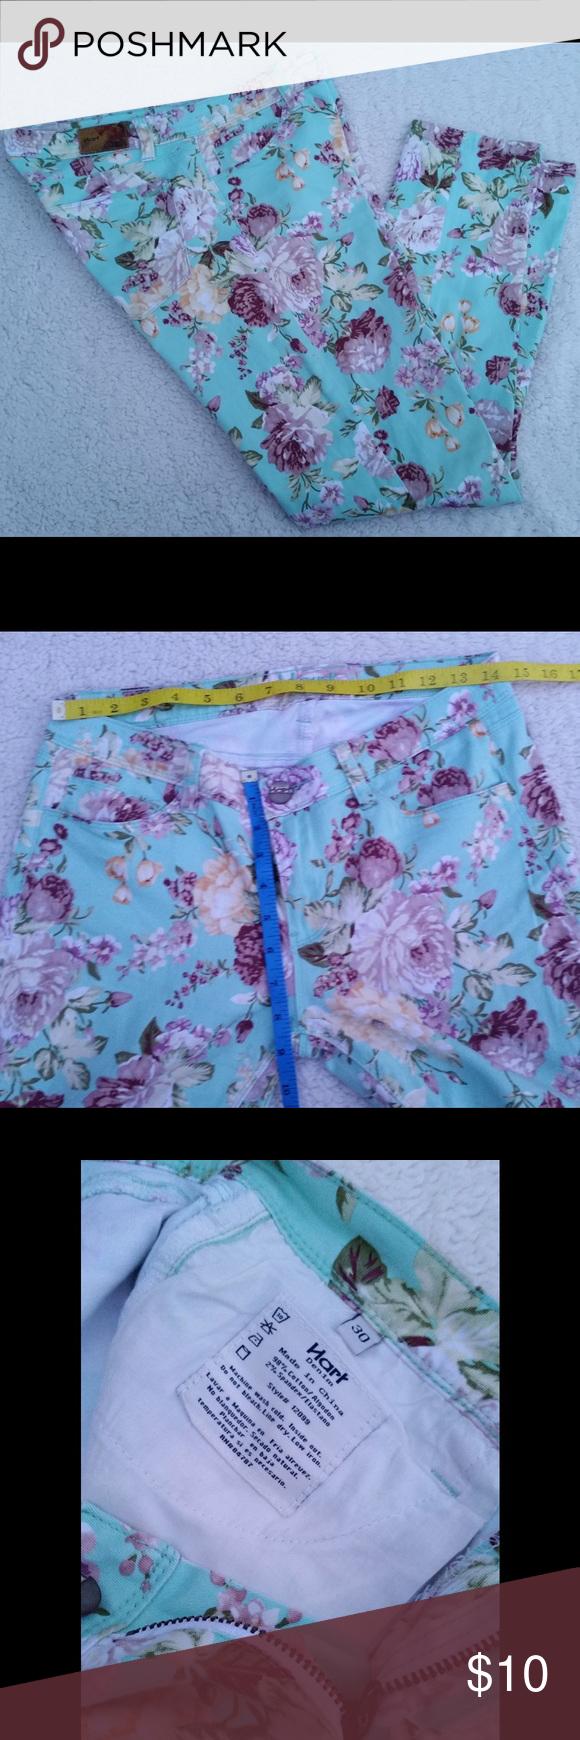 Hart Denim - Floral Print in size 30 Hart Denim - Floral Print in size 30 hart Jeans Straight Leg